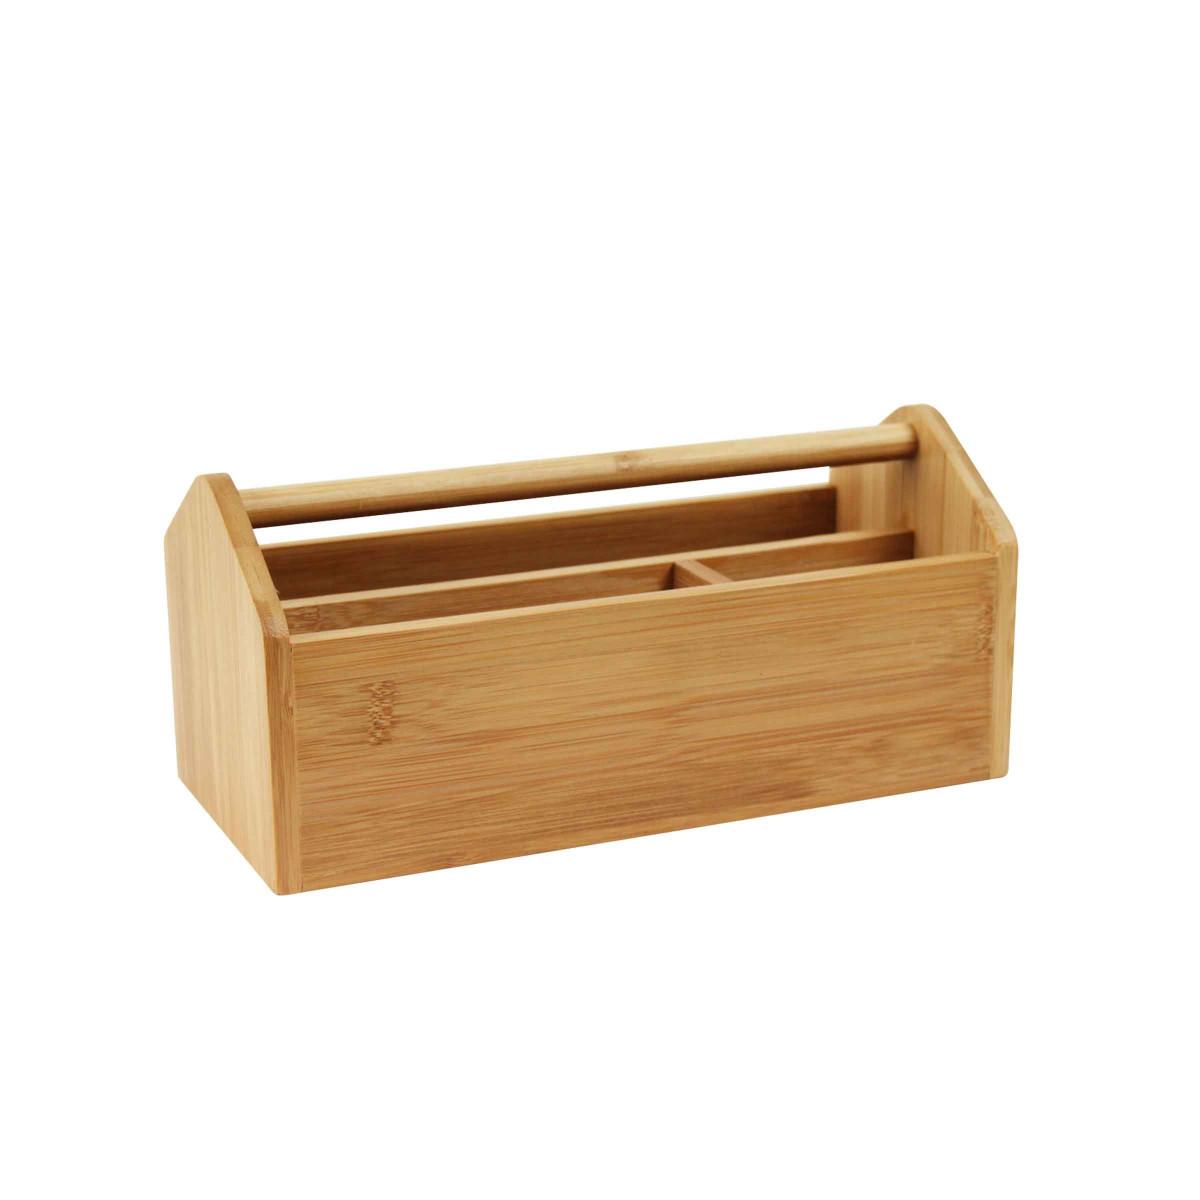 Organisateur de bureau en bambou - Portable on